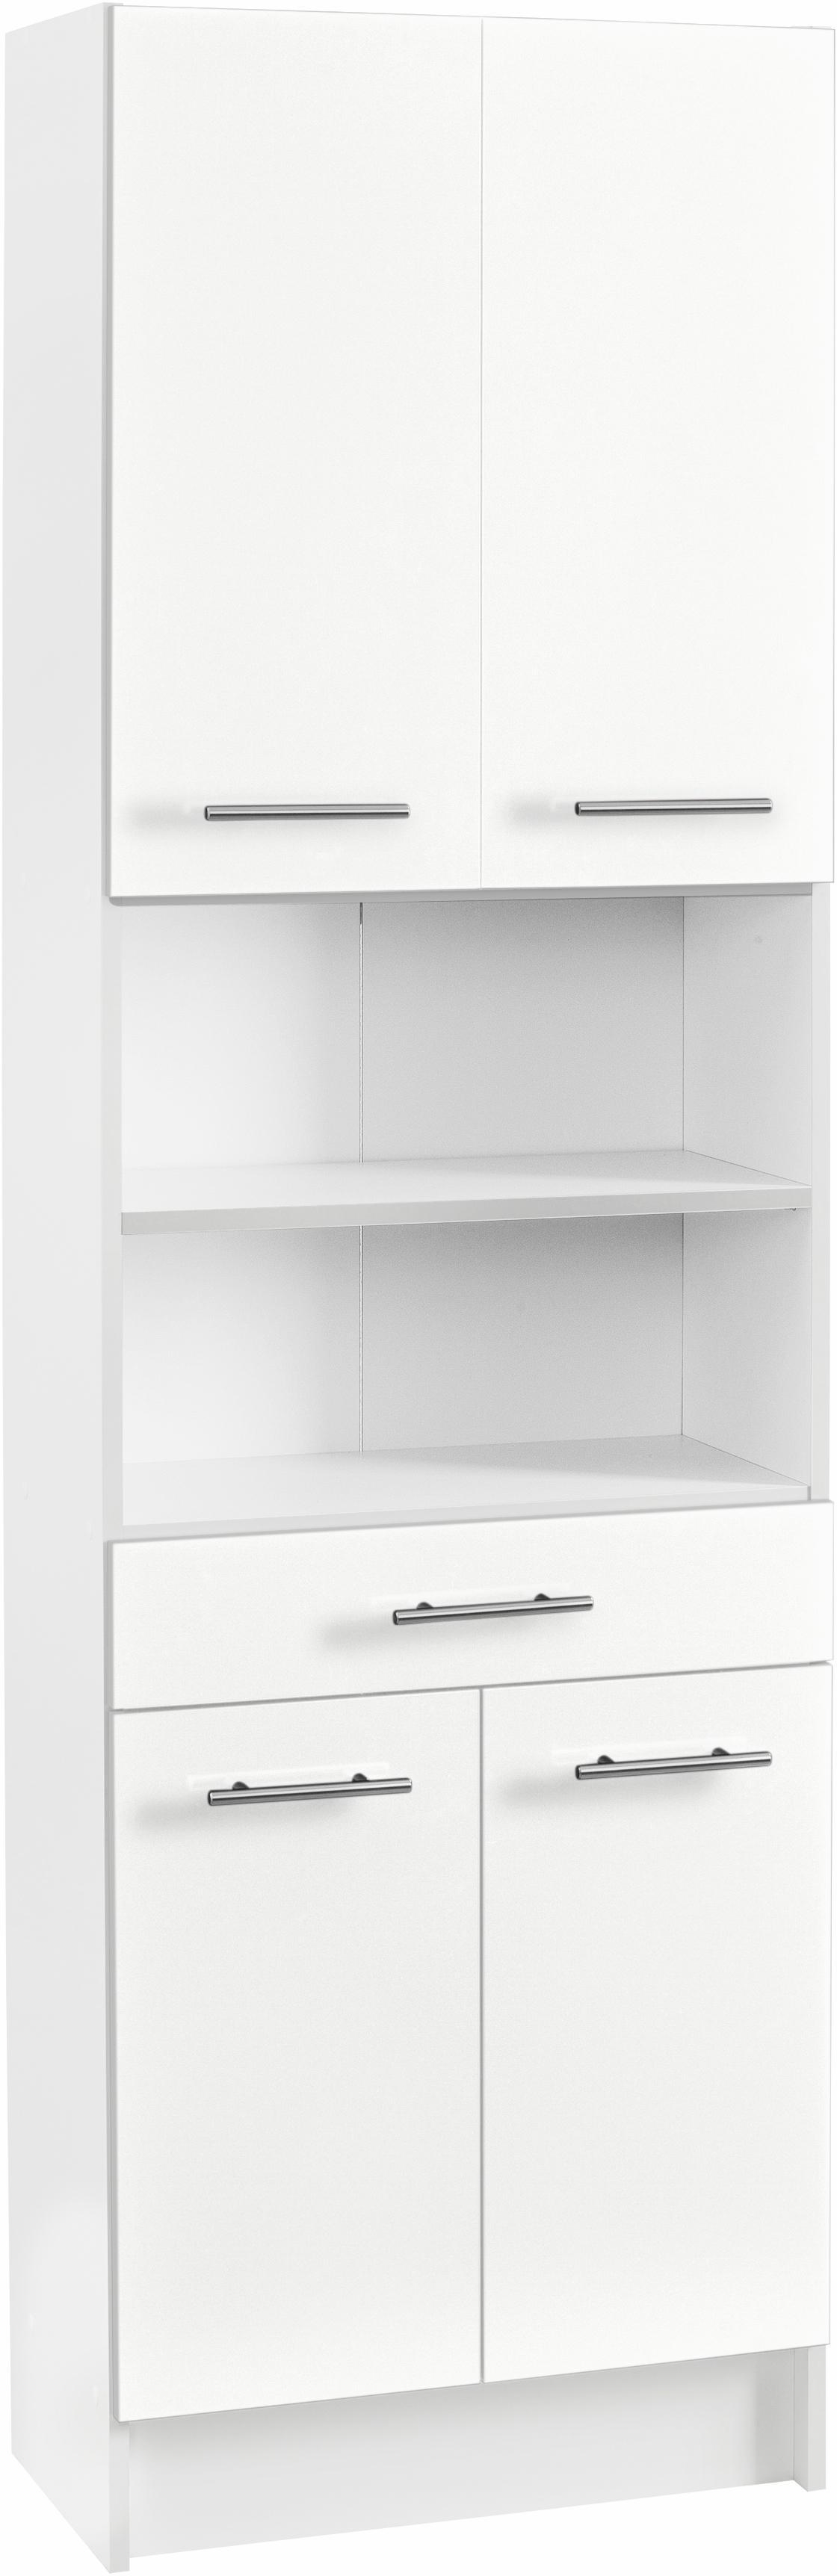 Badkamerkast 30 Cm.Ikea Hoge Keukenkast 40 Cm Breed Informatie Over De Keuken